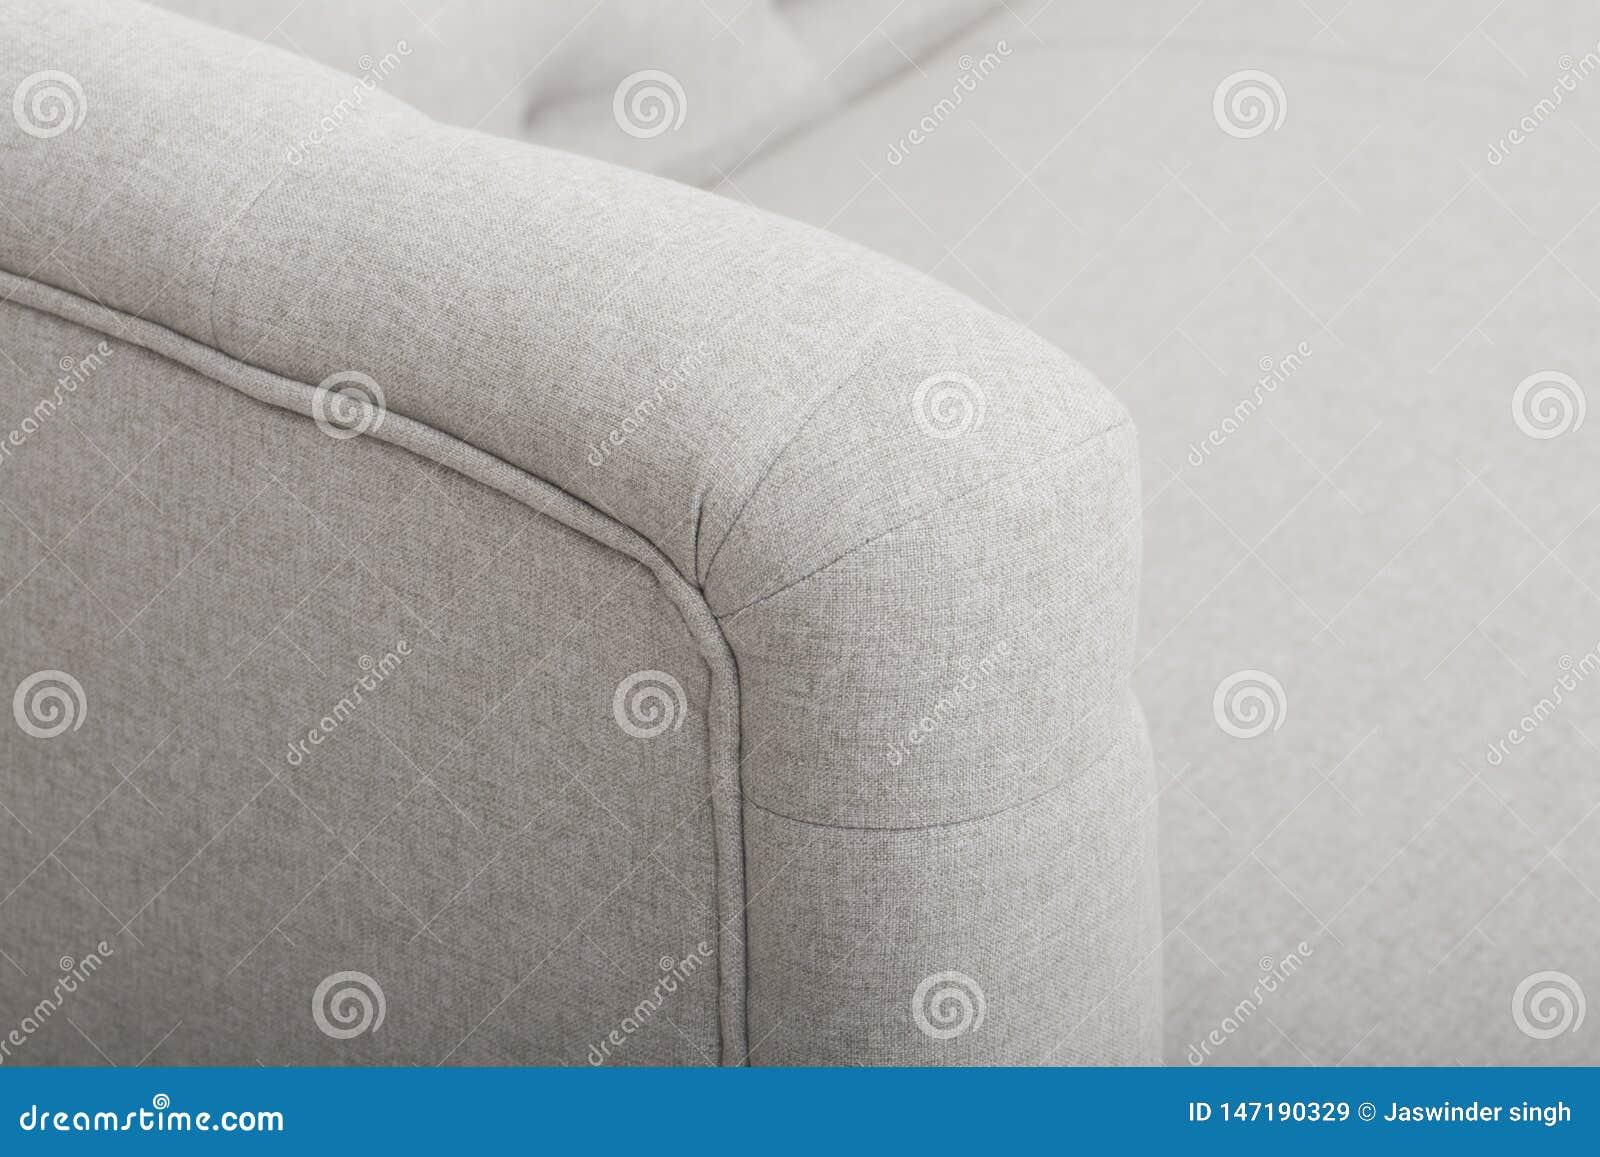 Enjoyable Dwell Home Roskilde 3 Seater Minimalist Sofa Bed Maeva 3 Pdpeps Interior Chair Design Pdpepsorg